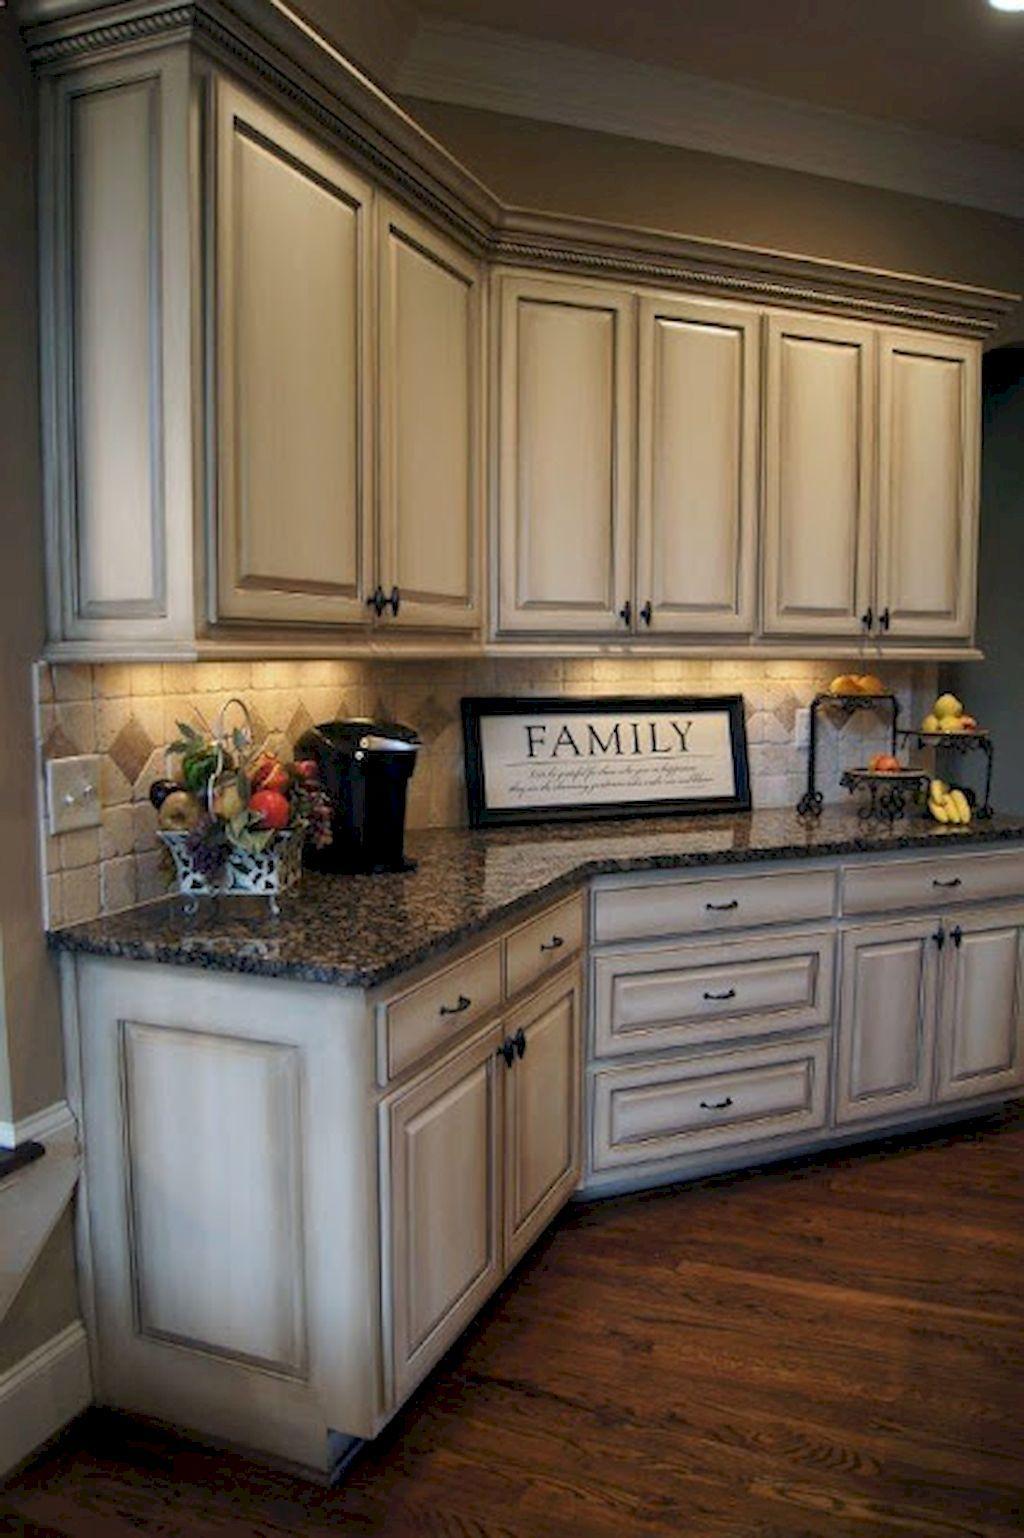 150 Gorgeous Farmhouse Kitchen Cabinets Makeover Ideas 103 Antique White Kitchen Rustic Kitchen Cabinets Antique White Kitchen Cabinets